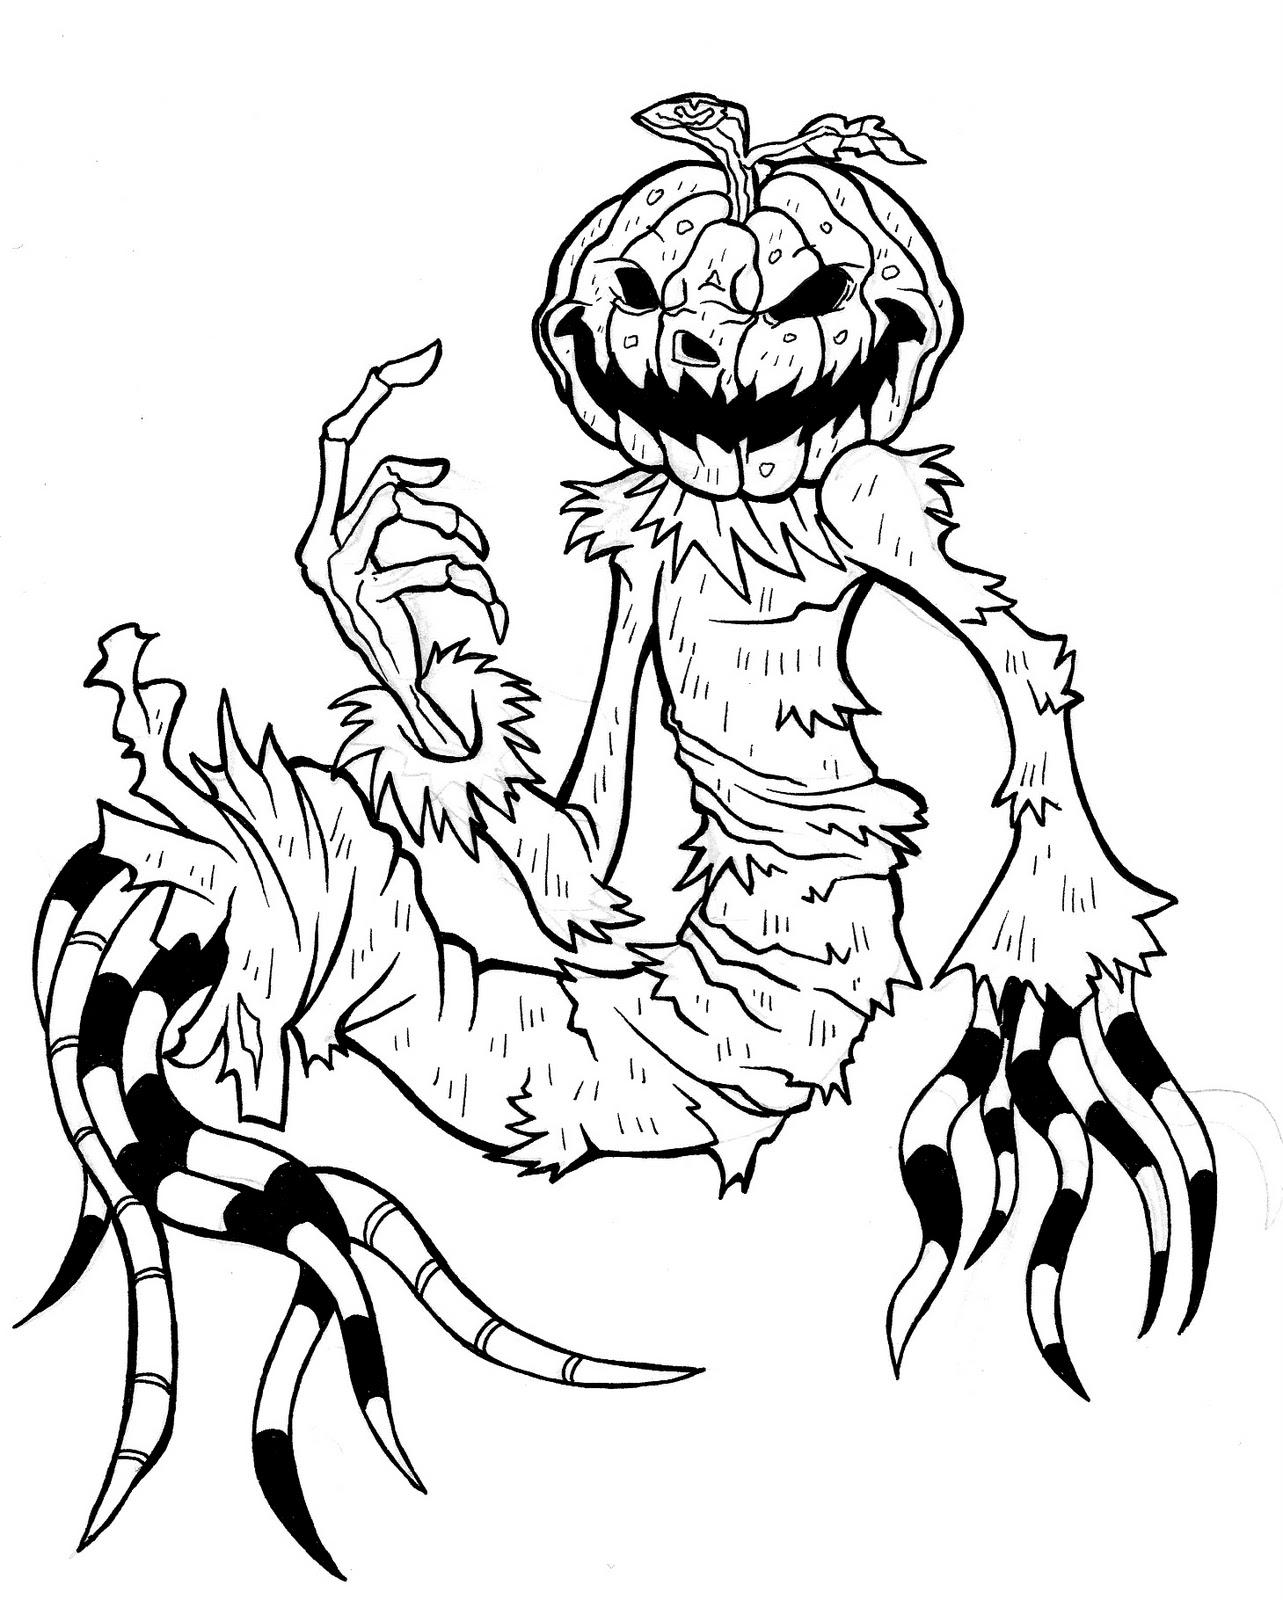 Hell iud ravelo art calabaza halloween for Calabaza halloween dibujo